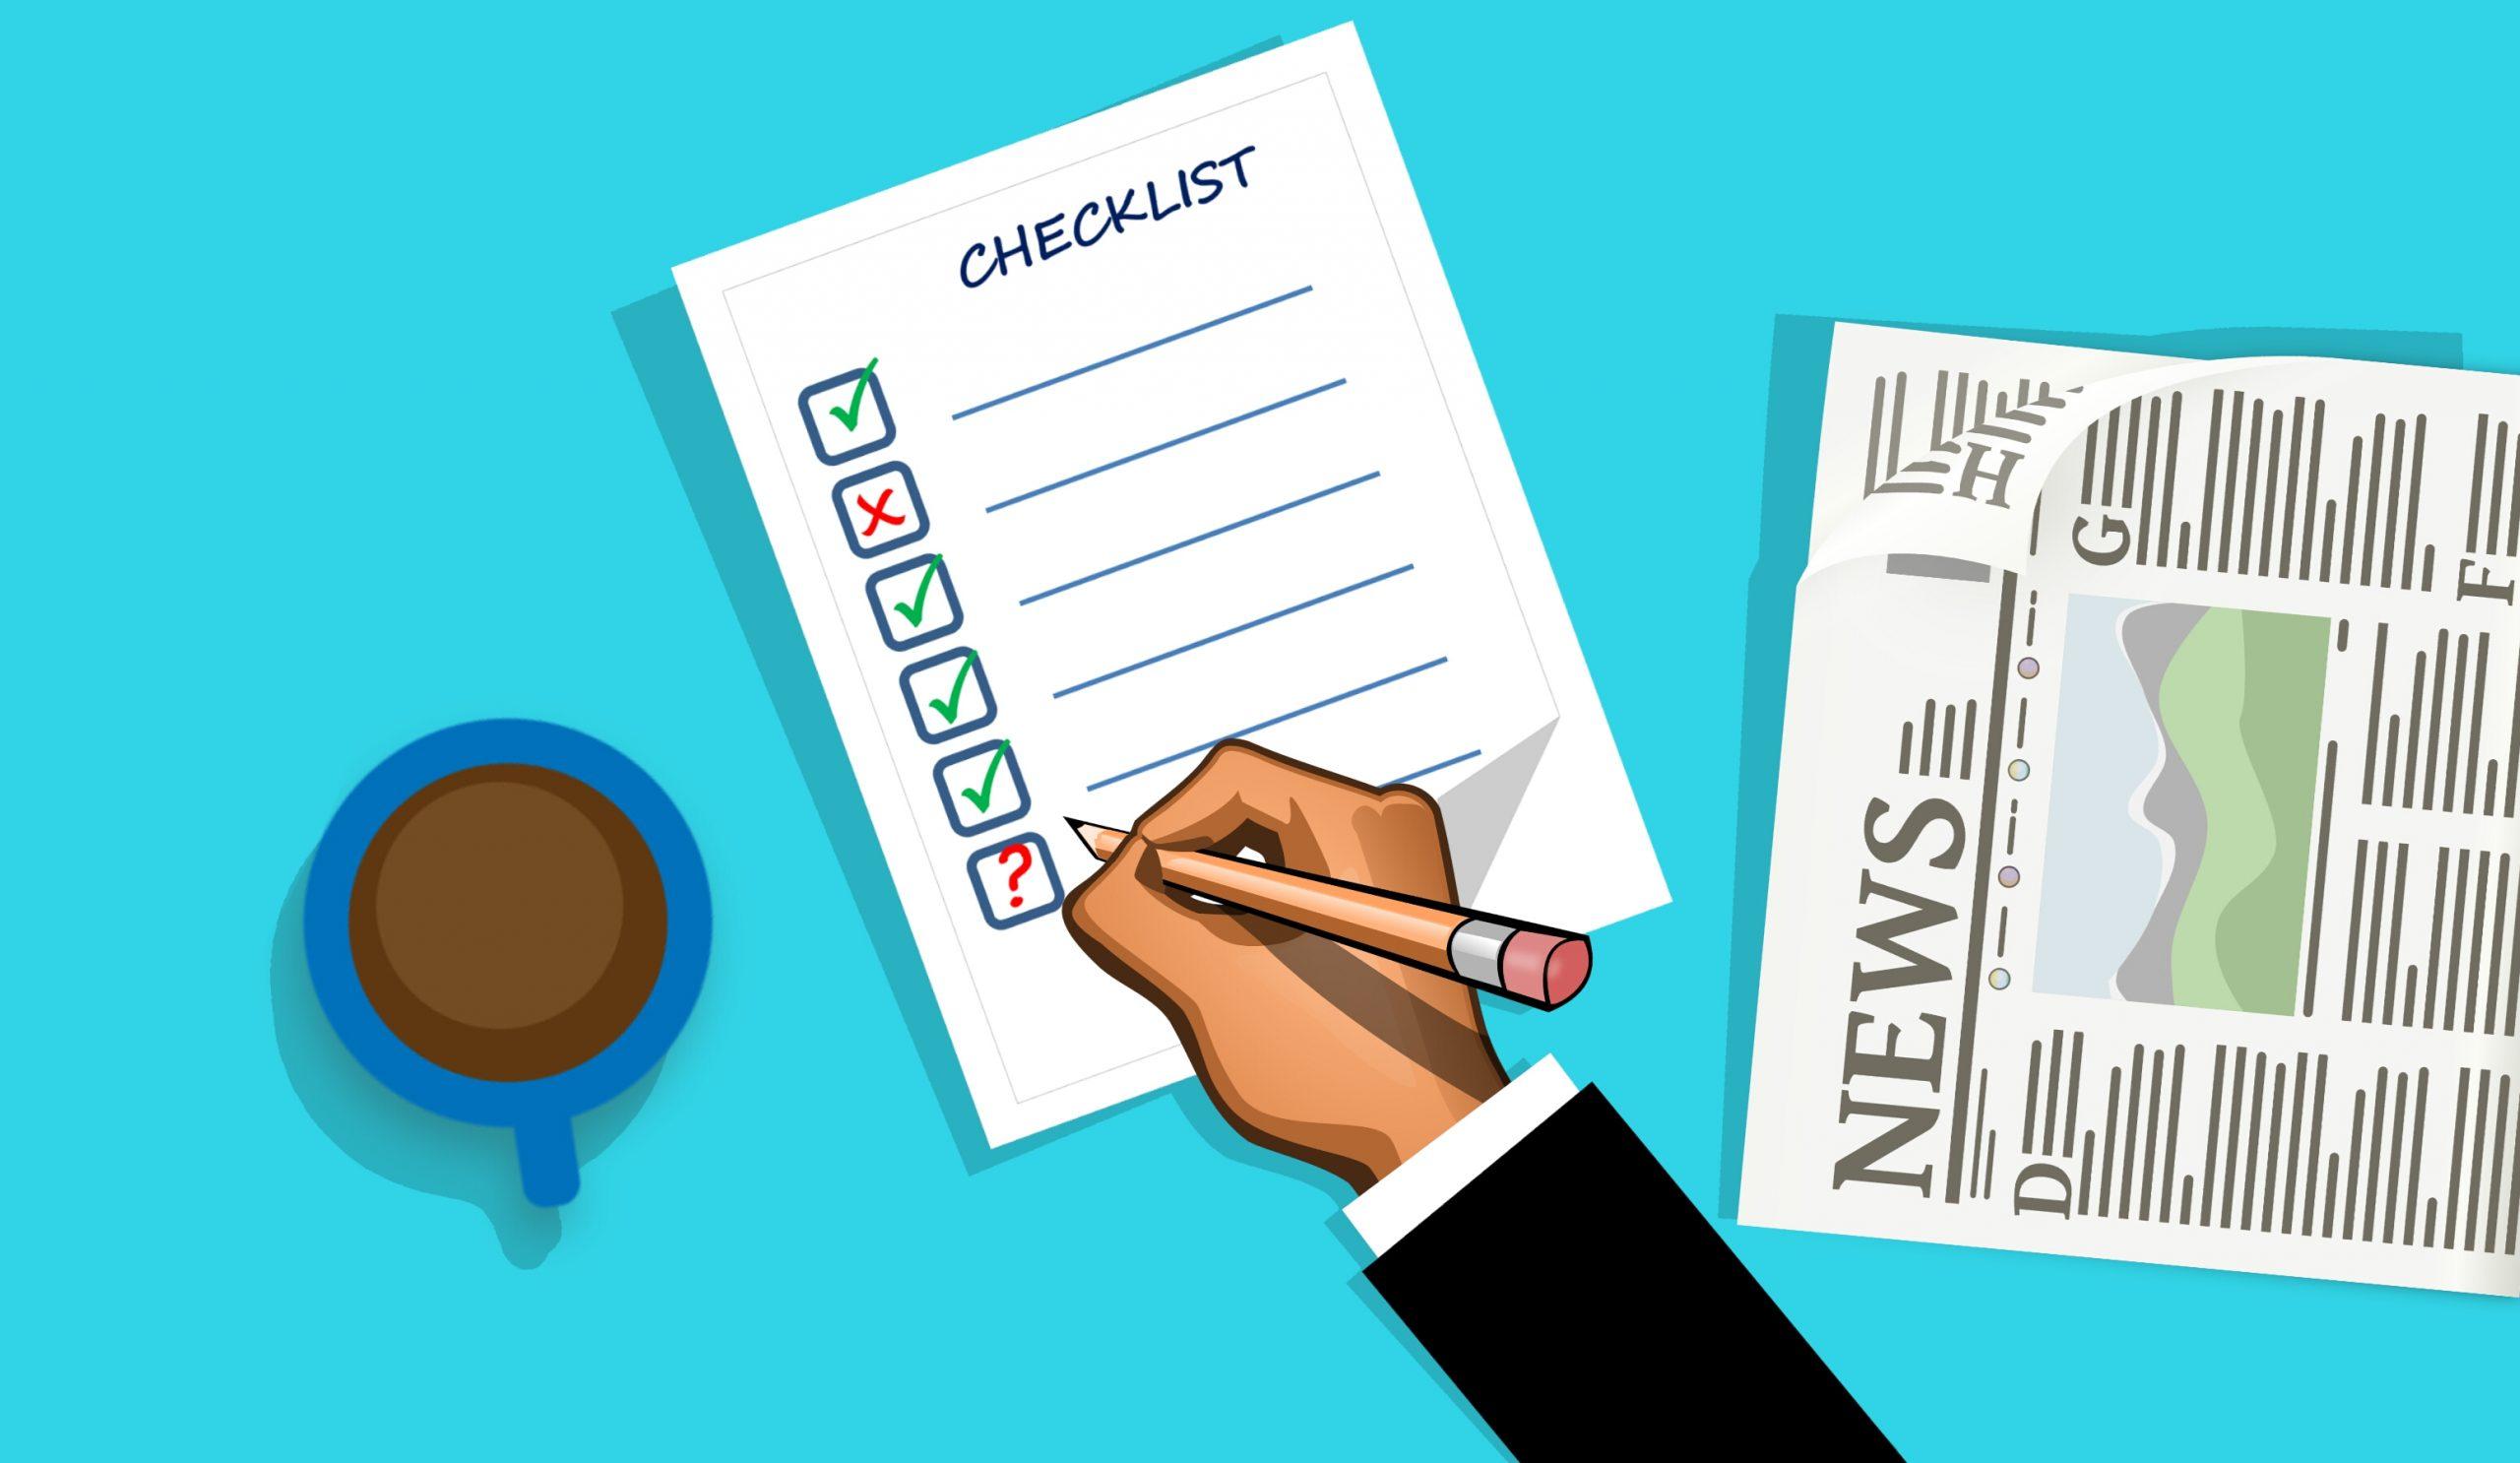 13-Point Checkist For Choosing a Sheet-Fed Digital Press